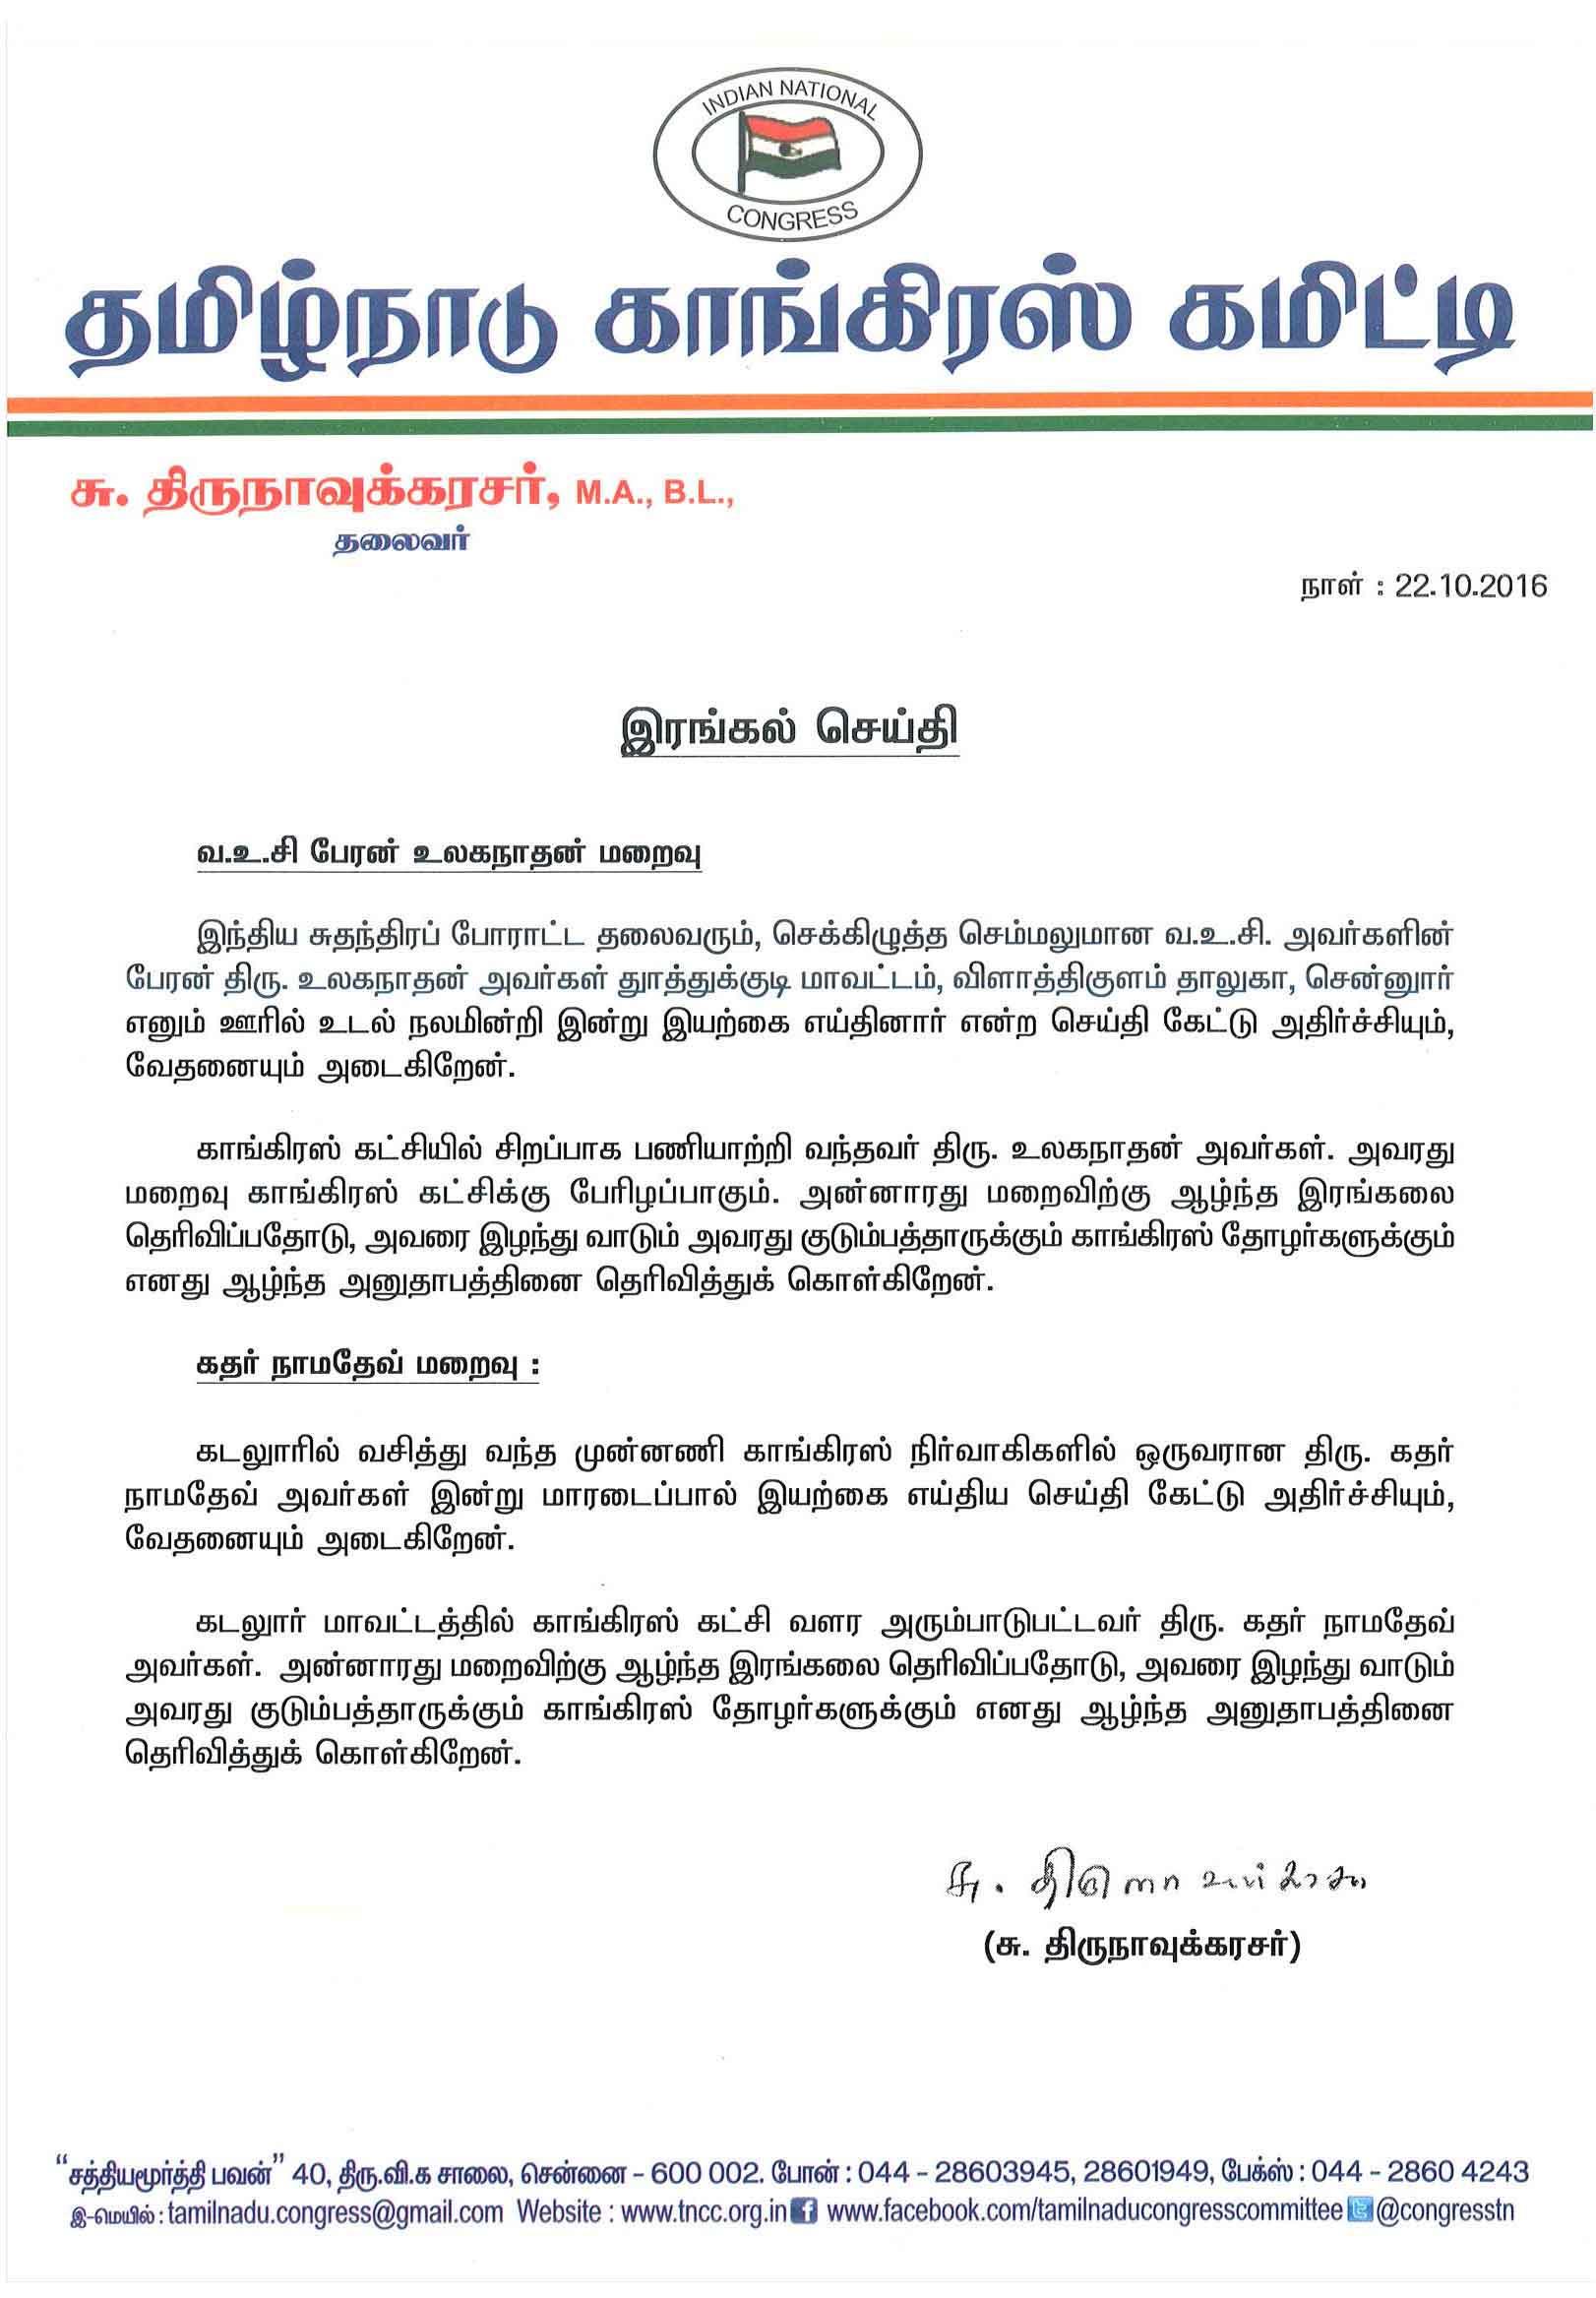 tncc-presidents-condolence-message-22-10-2016